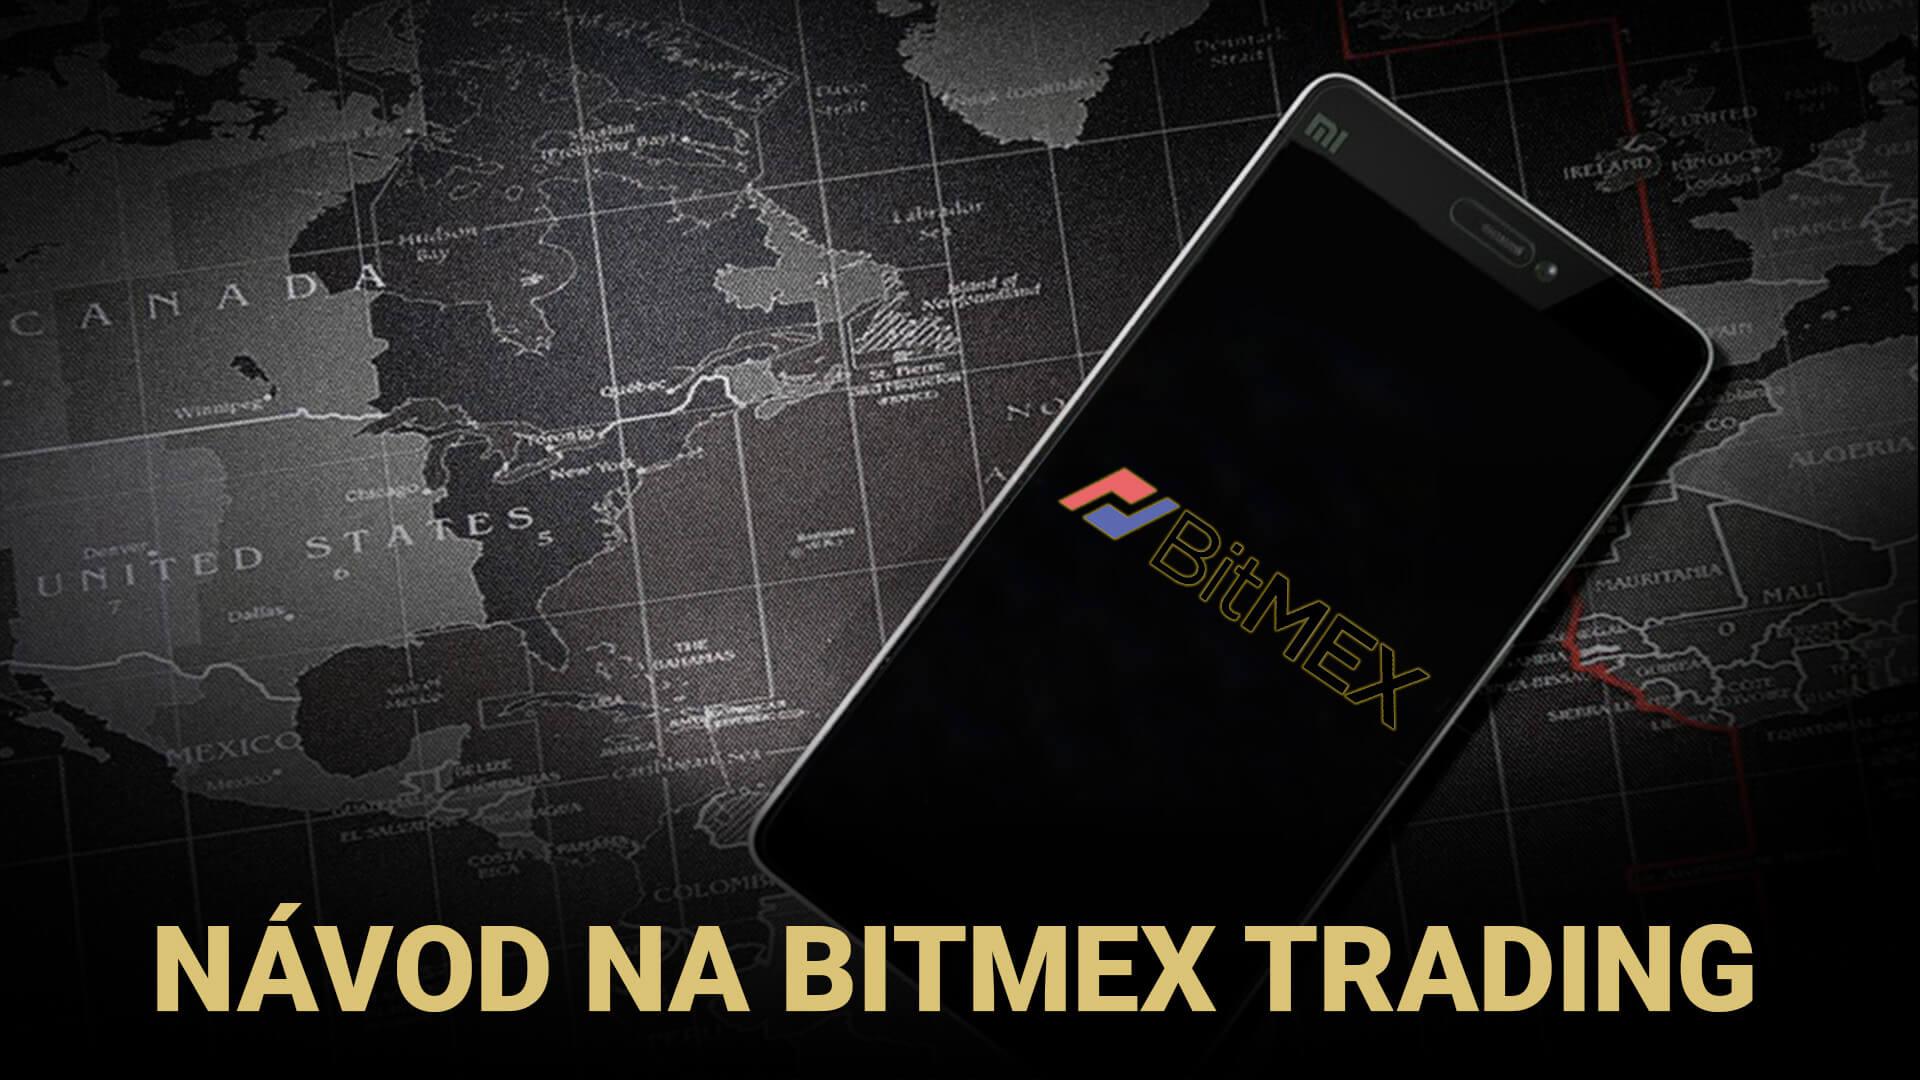 Návod na Bitmex trading image